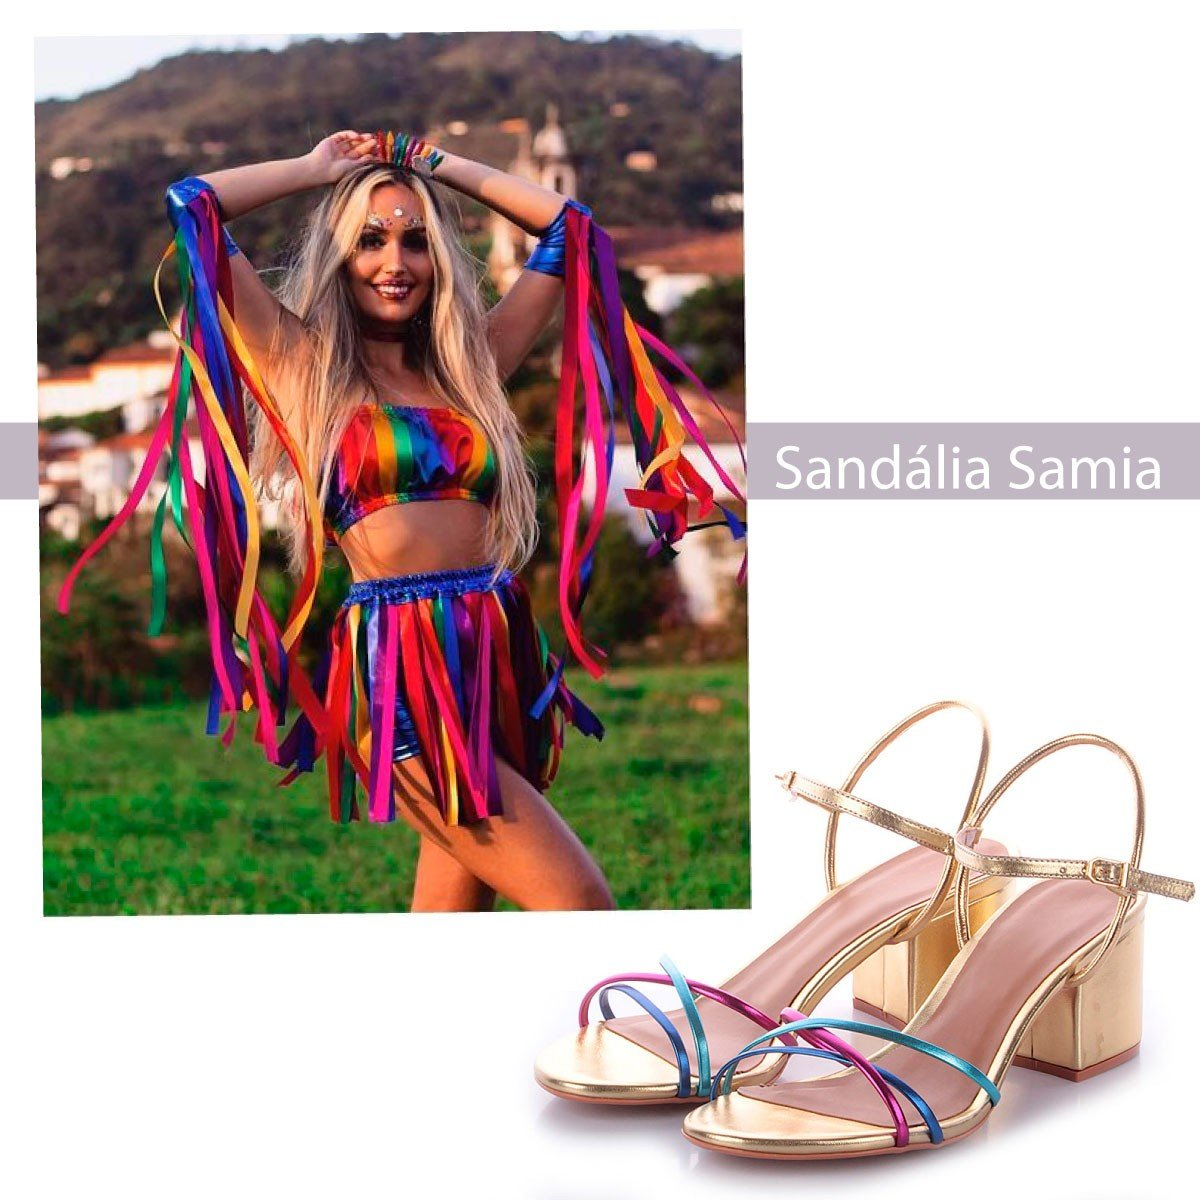 sandalia samia